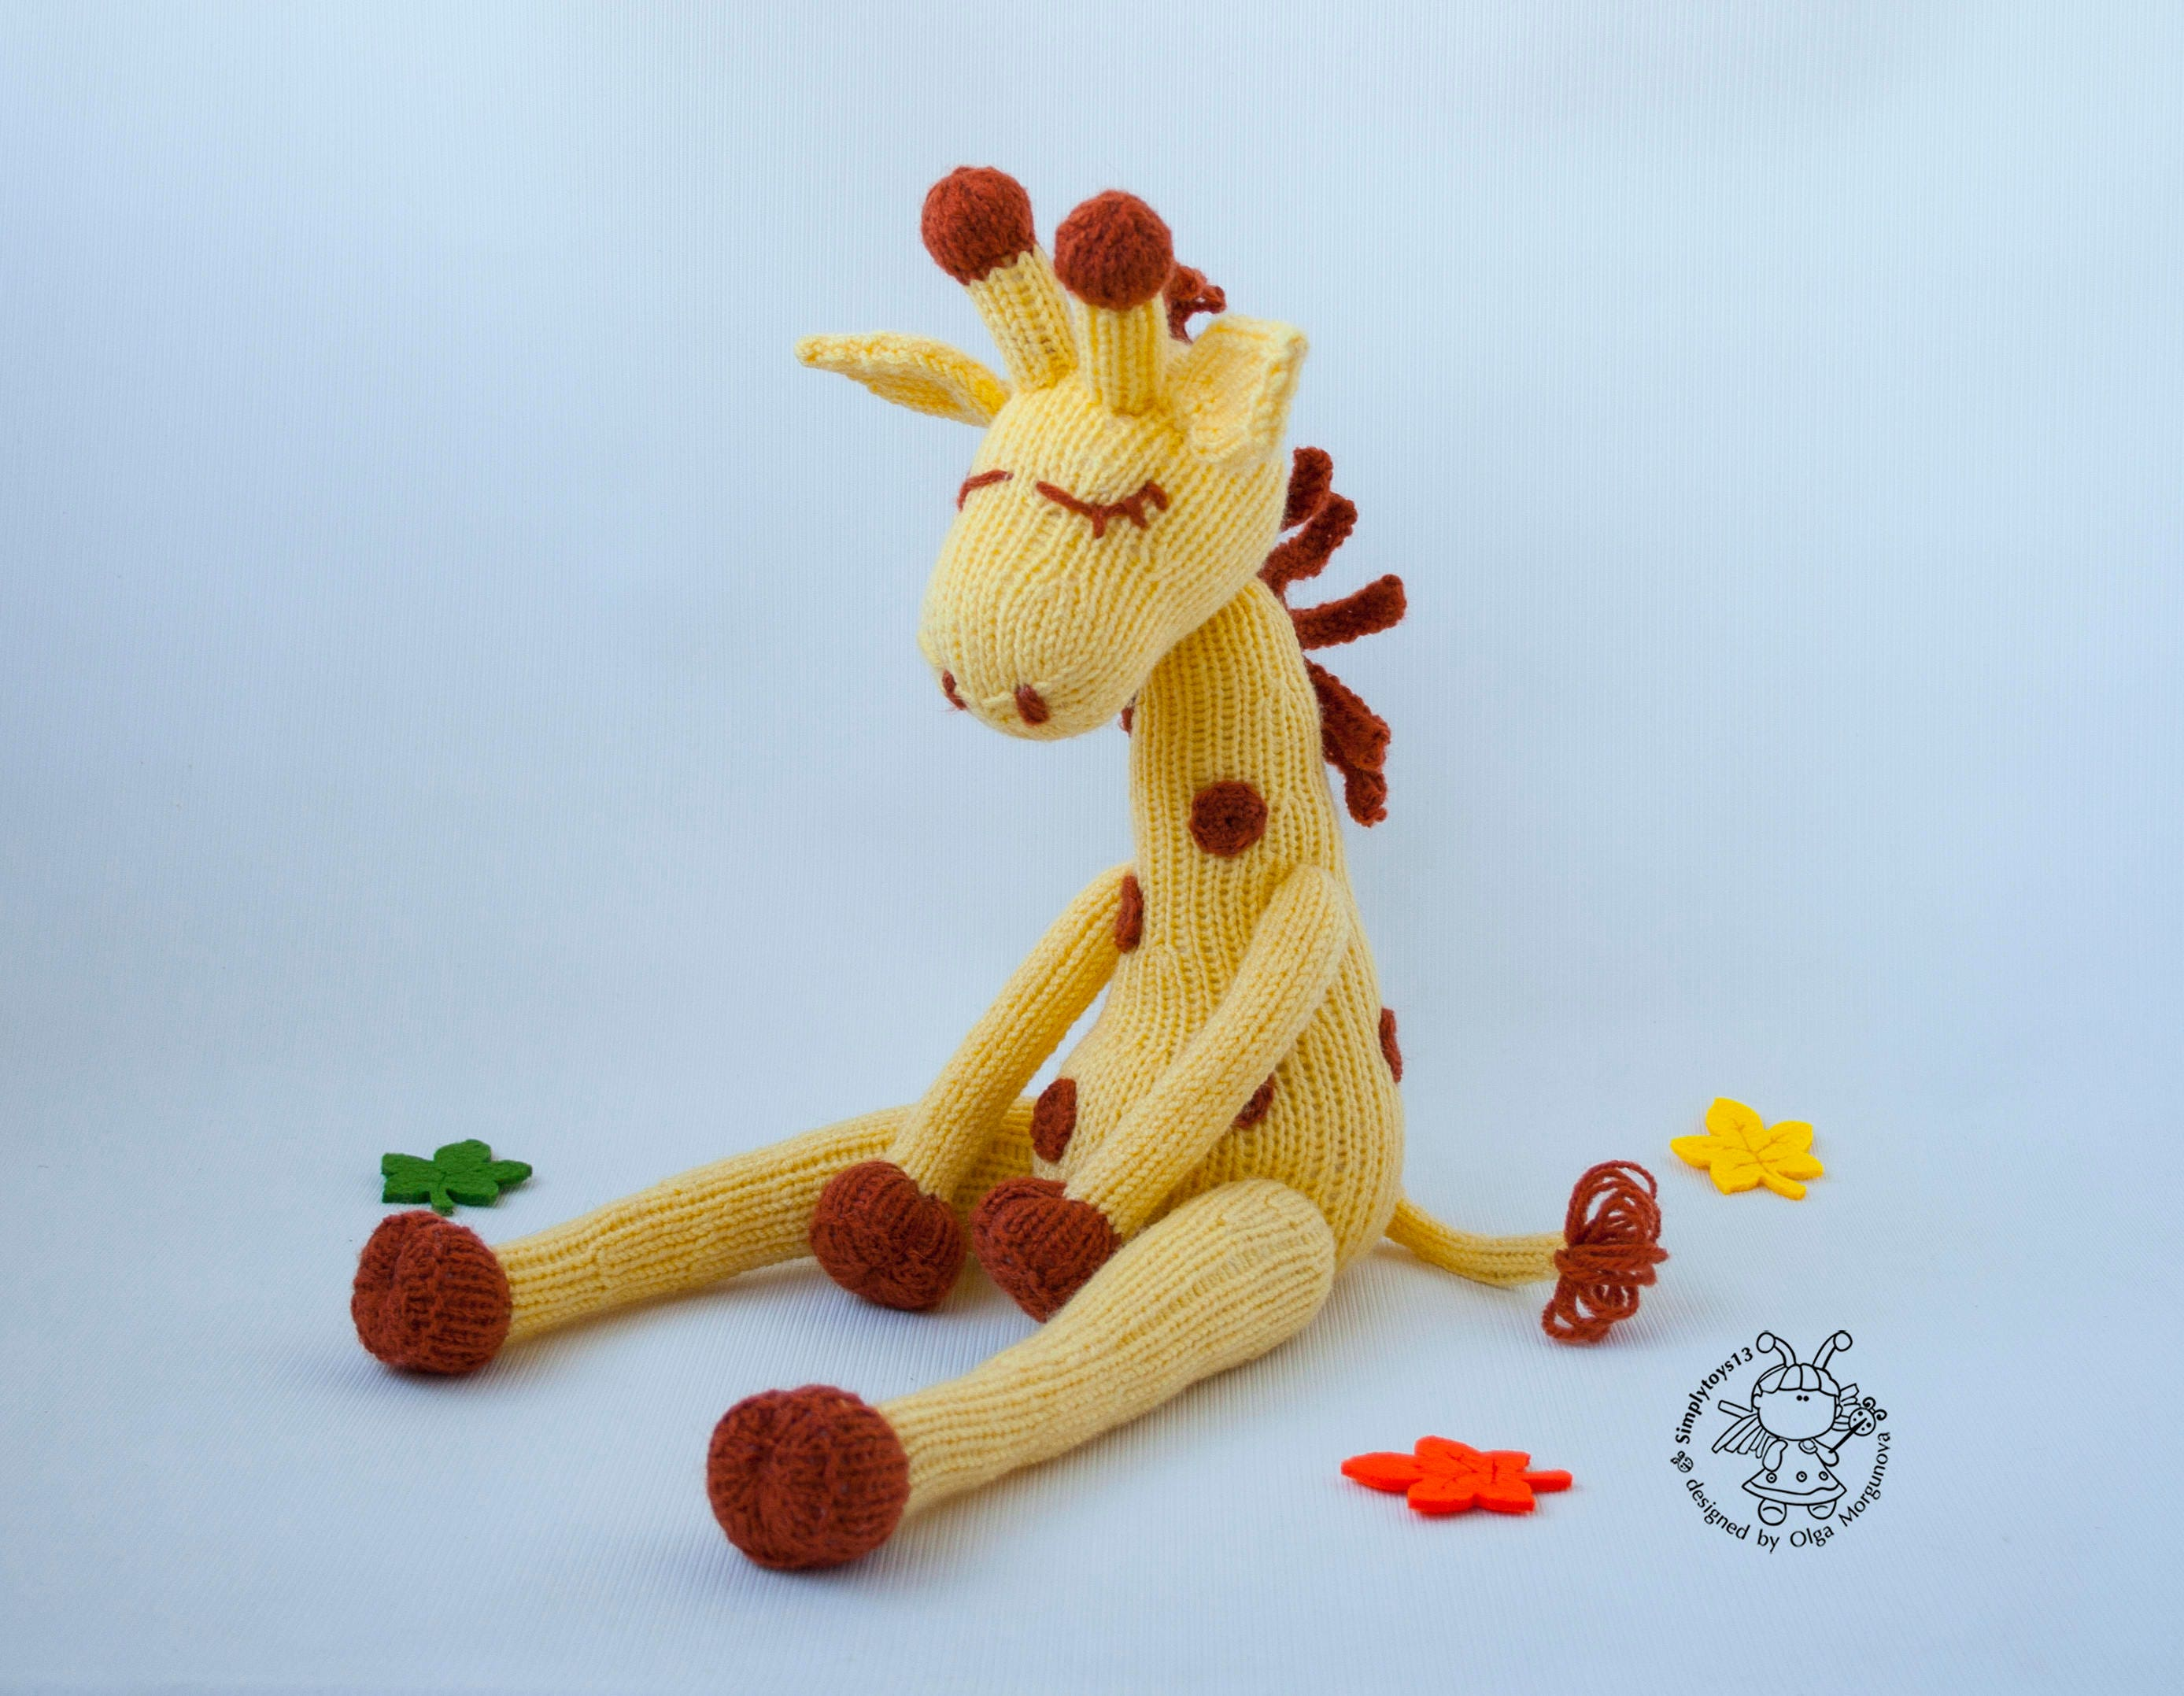 giraffe toy for baby amigurumi softie giraffe instant. Black Bedroom Furniture Sets. Home Design Ideas